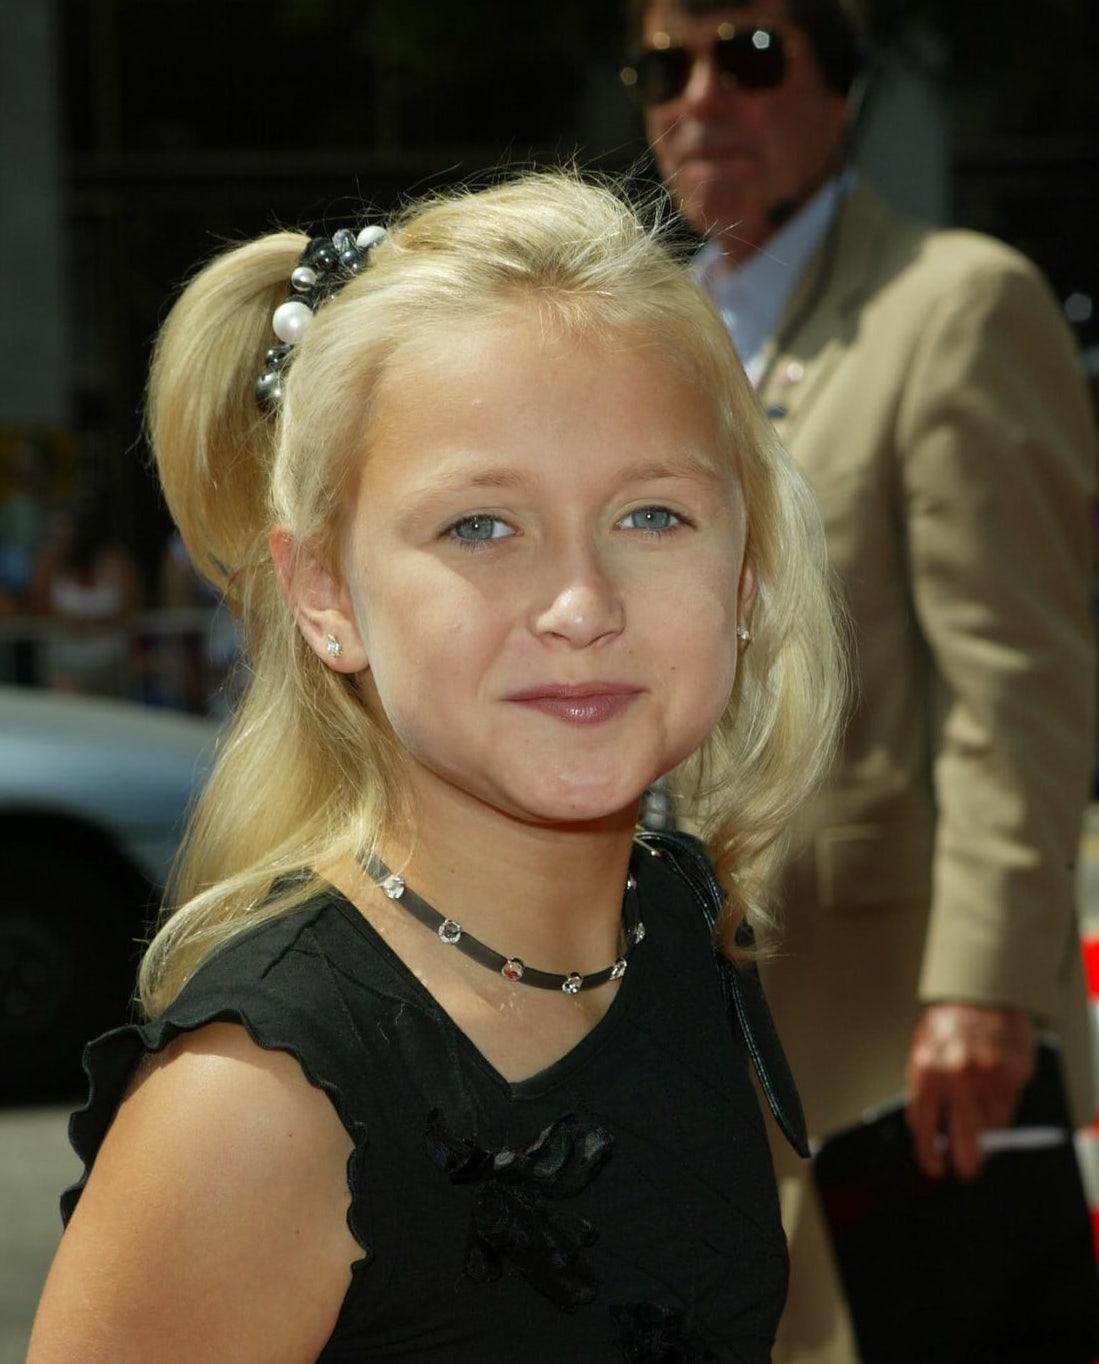 Skye McCole Bartusiak as a child star